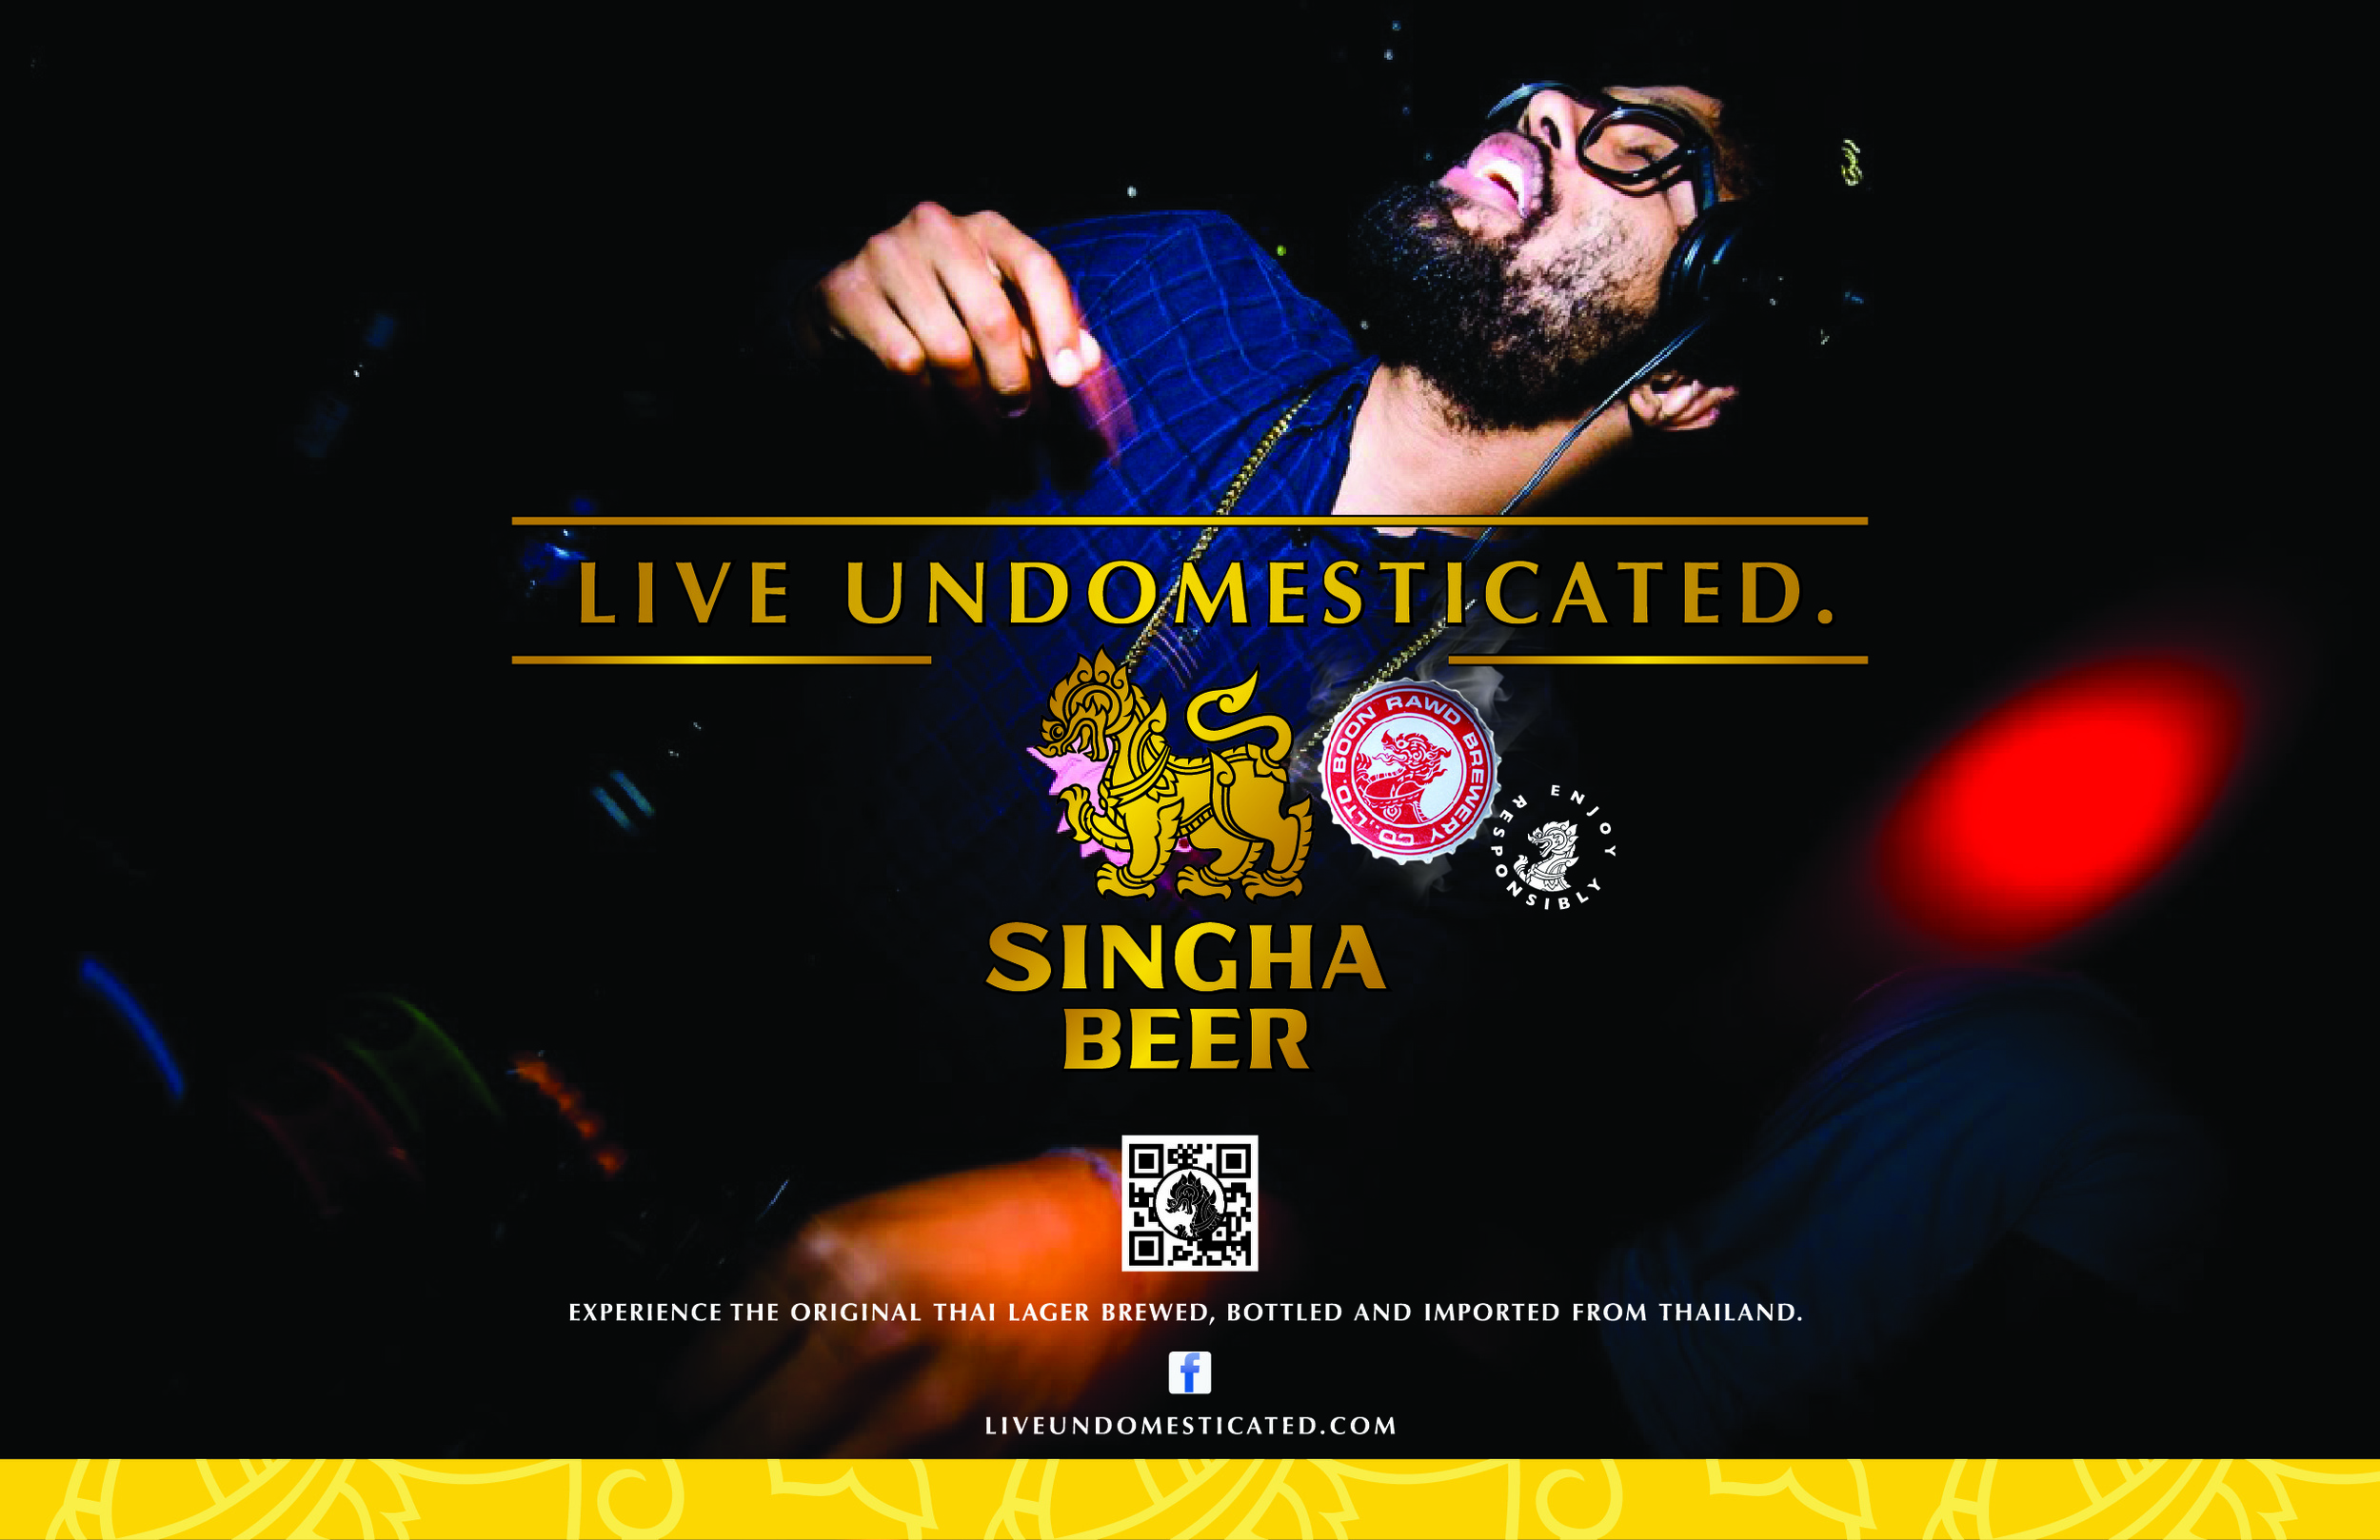 GERTRUDE_SINGHA BEER_LIVE UNDOMESTICATED_PRINT AD_SPREAD01.jpg